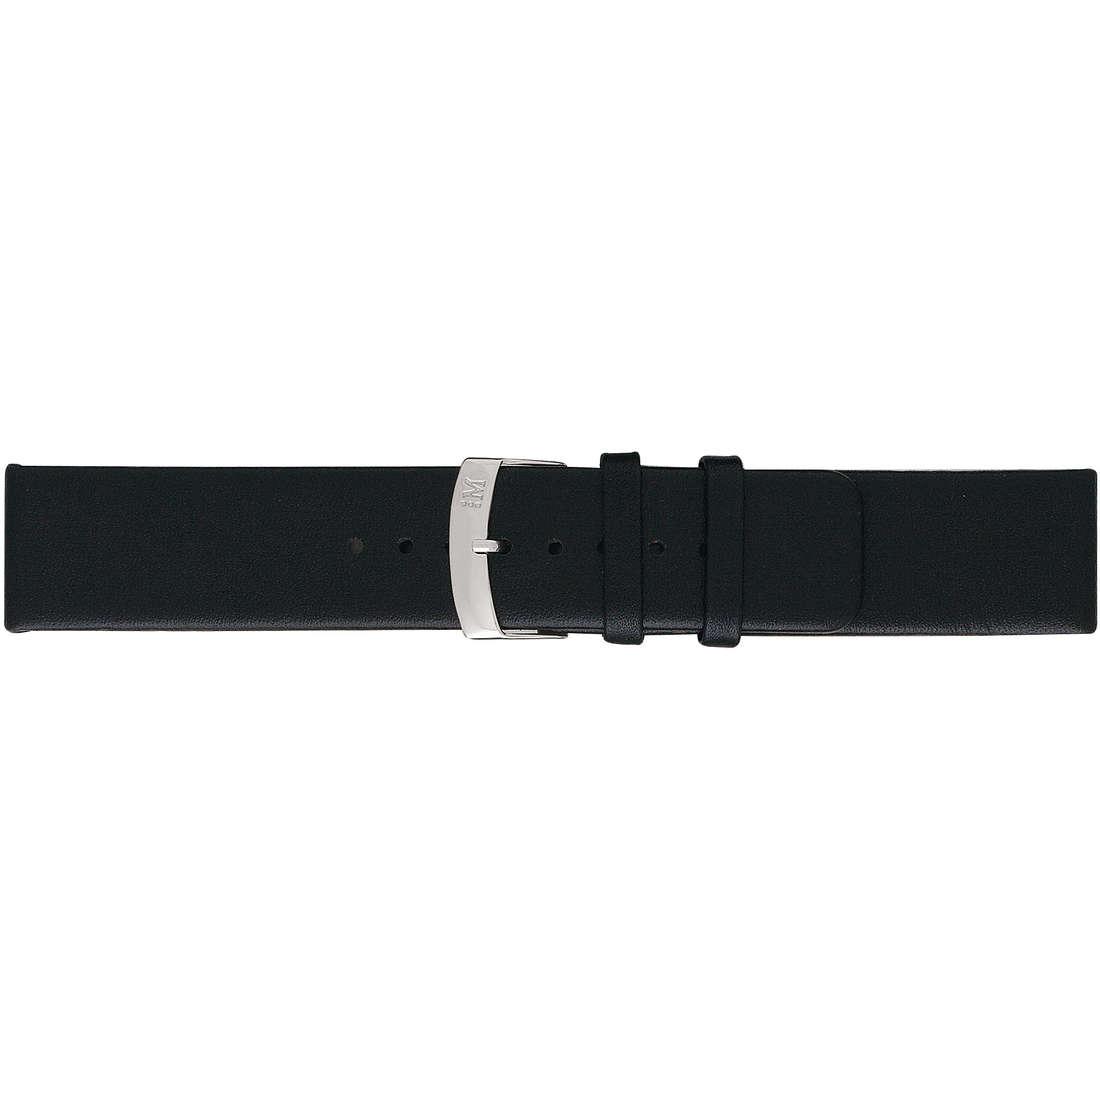 watch watch bands watch straps man Morellato Morellato 1930 A01X3076875019CR20